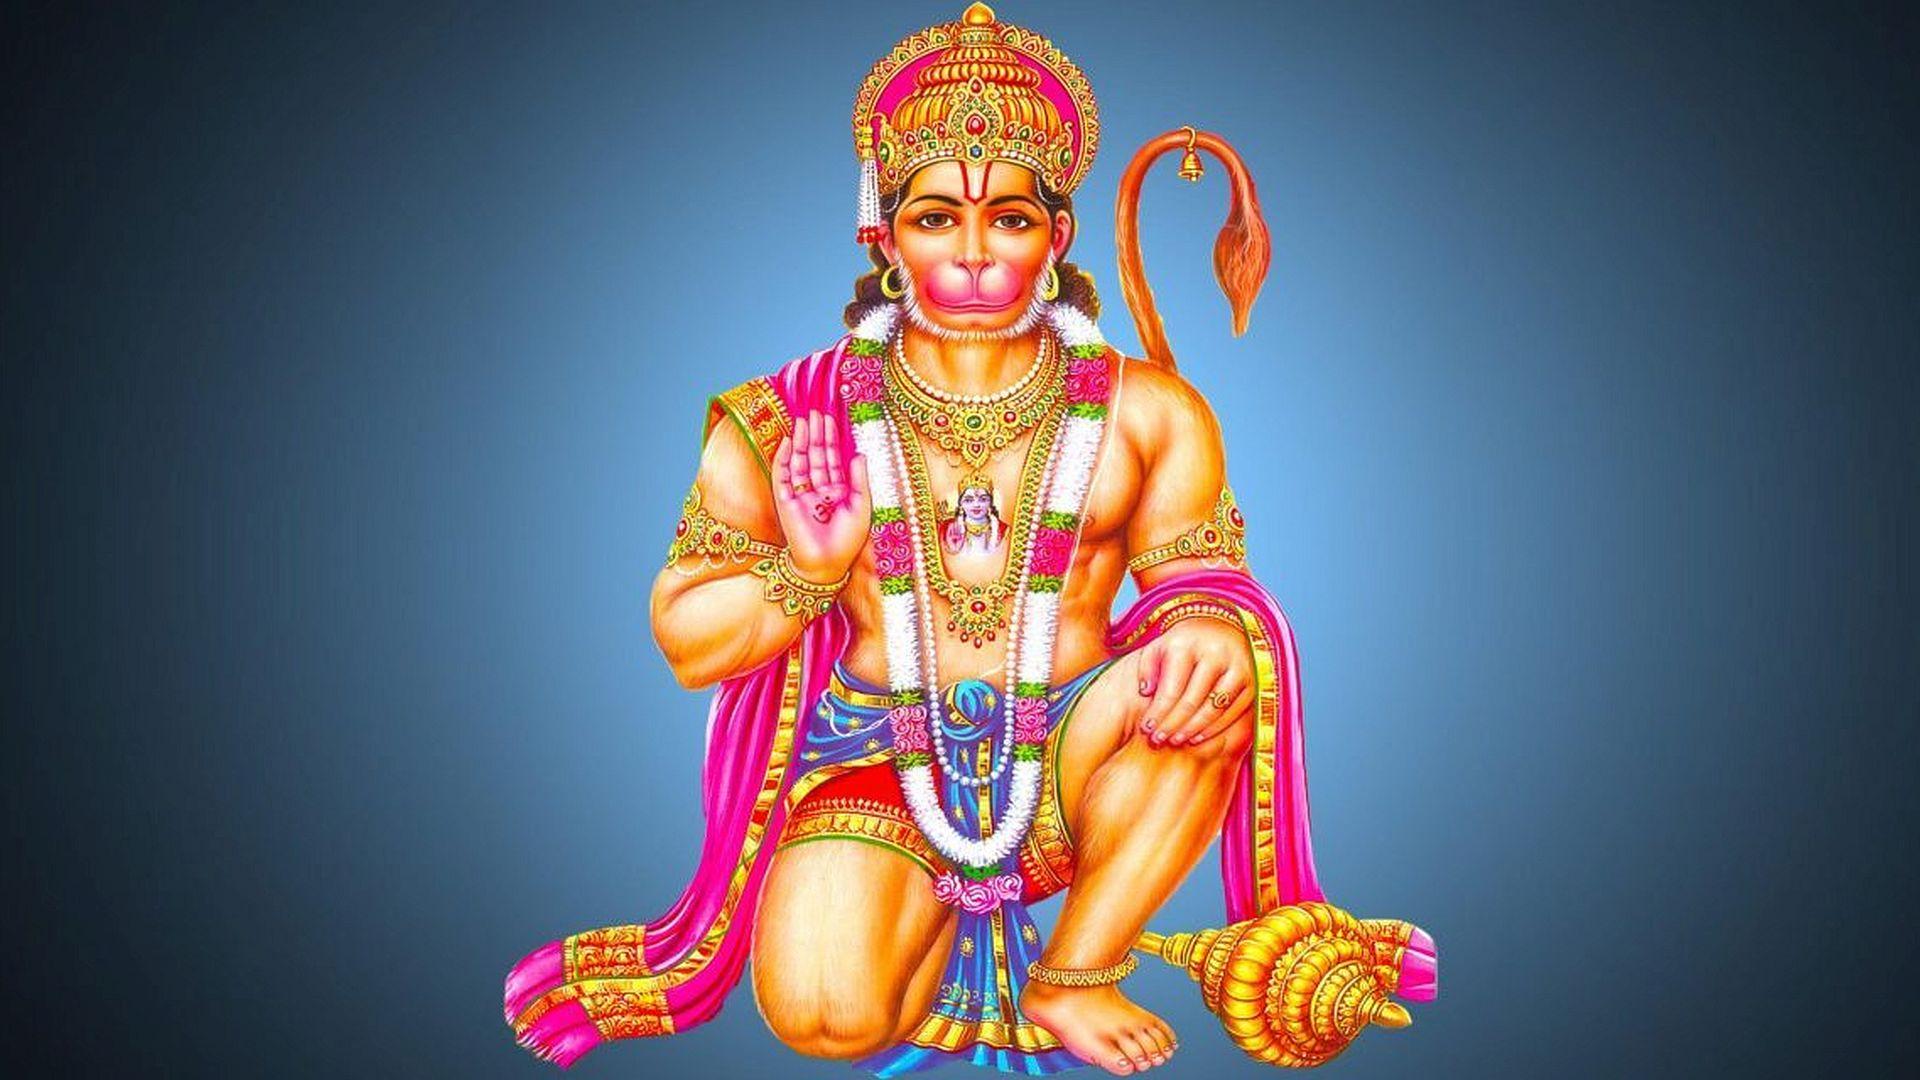 Lord Hanuman Hd Image Hindu Gods And Goddesses